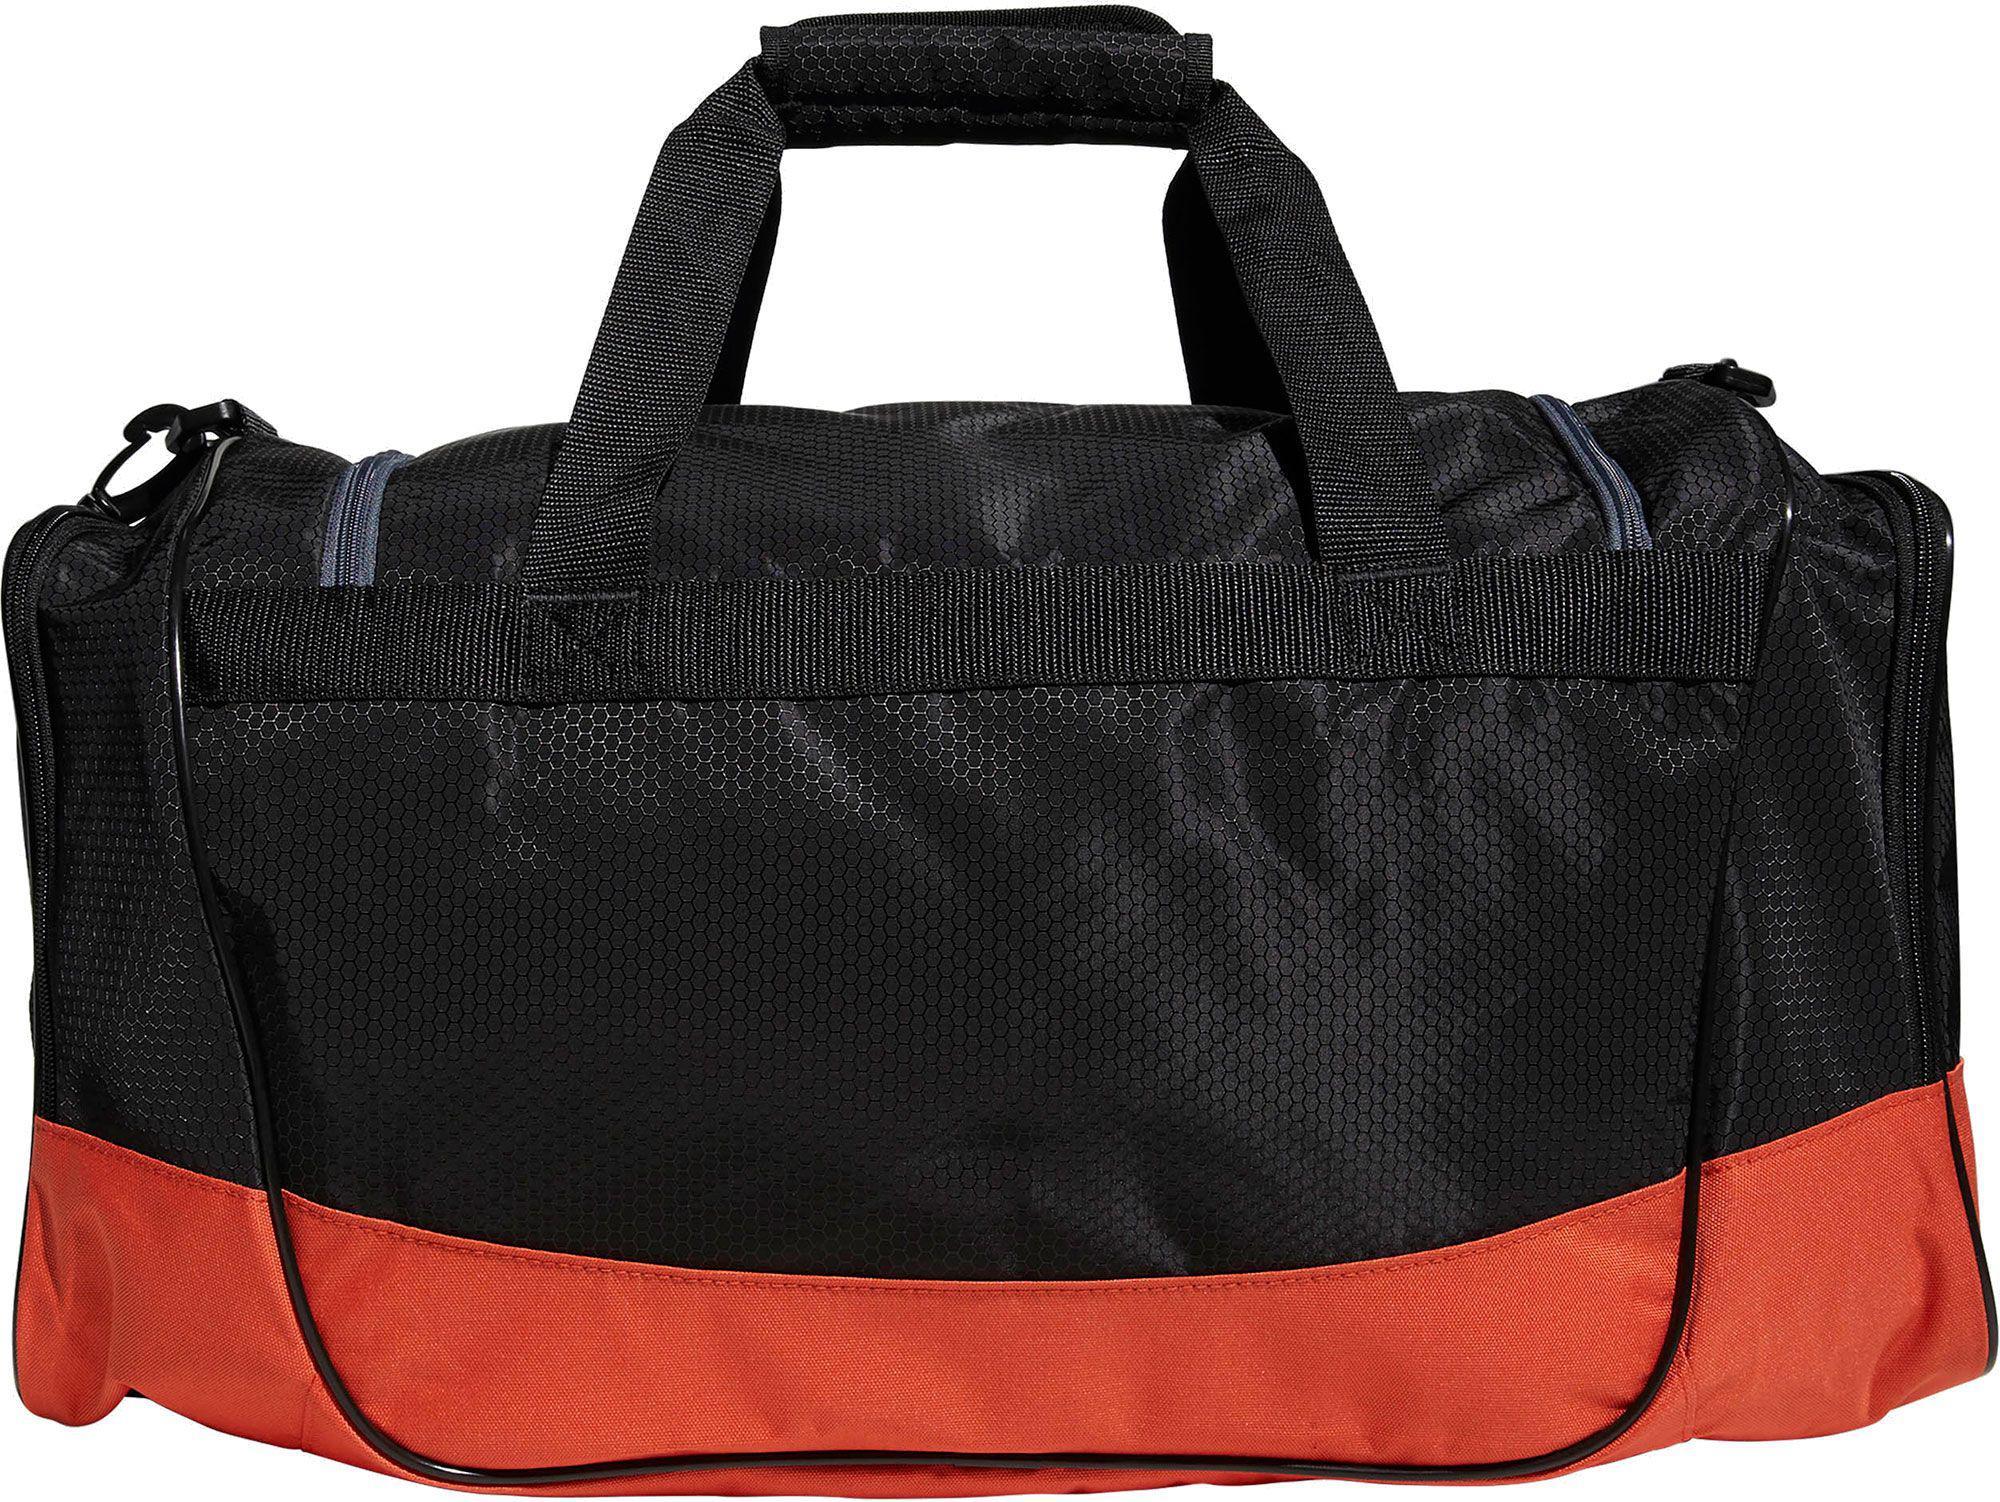 2761aad0dc8f Adidas - Black Defender Iii Medium Duffle Bag for Men - Lyst. View  fullscreen